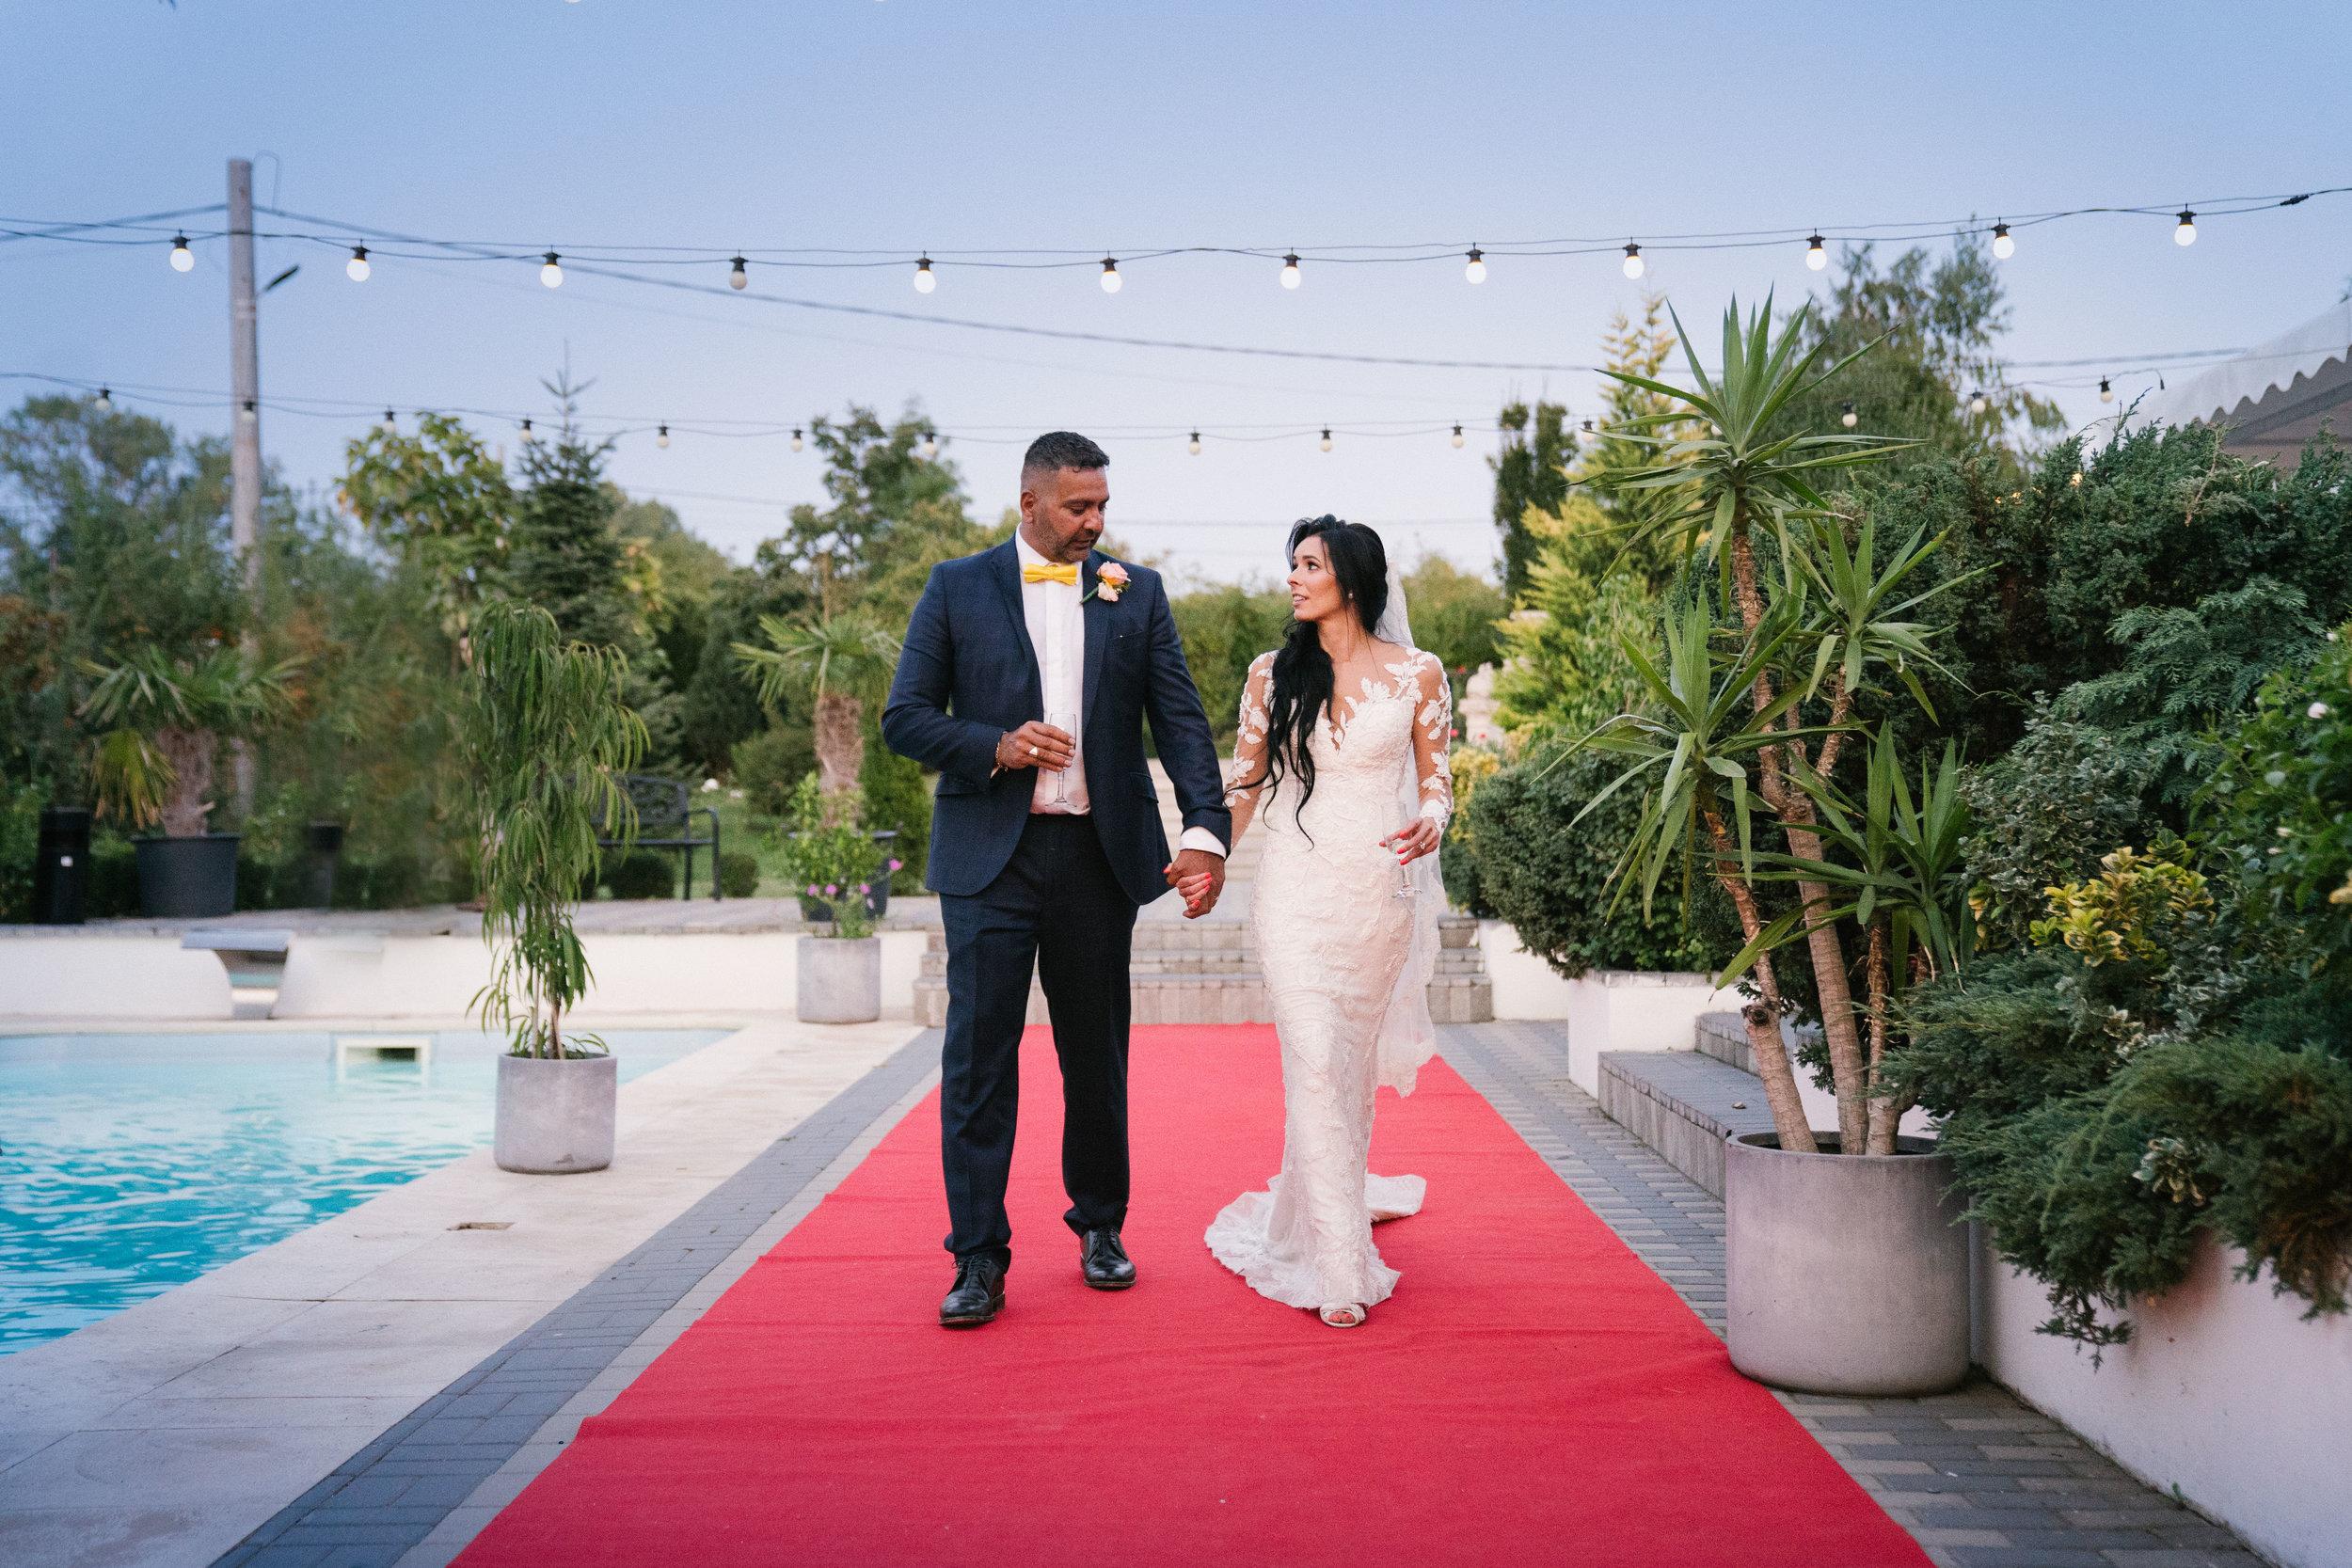 london-romania-destination-wedding-photographer-videographer-90